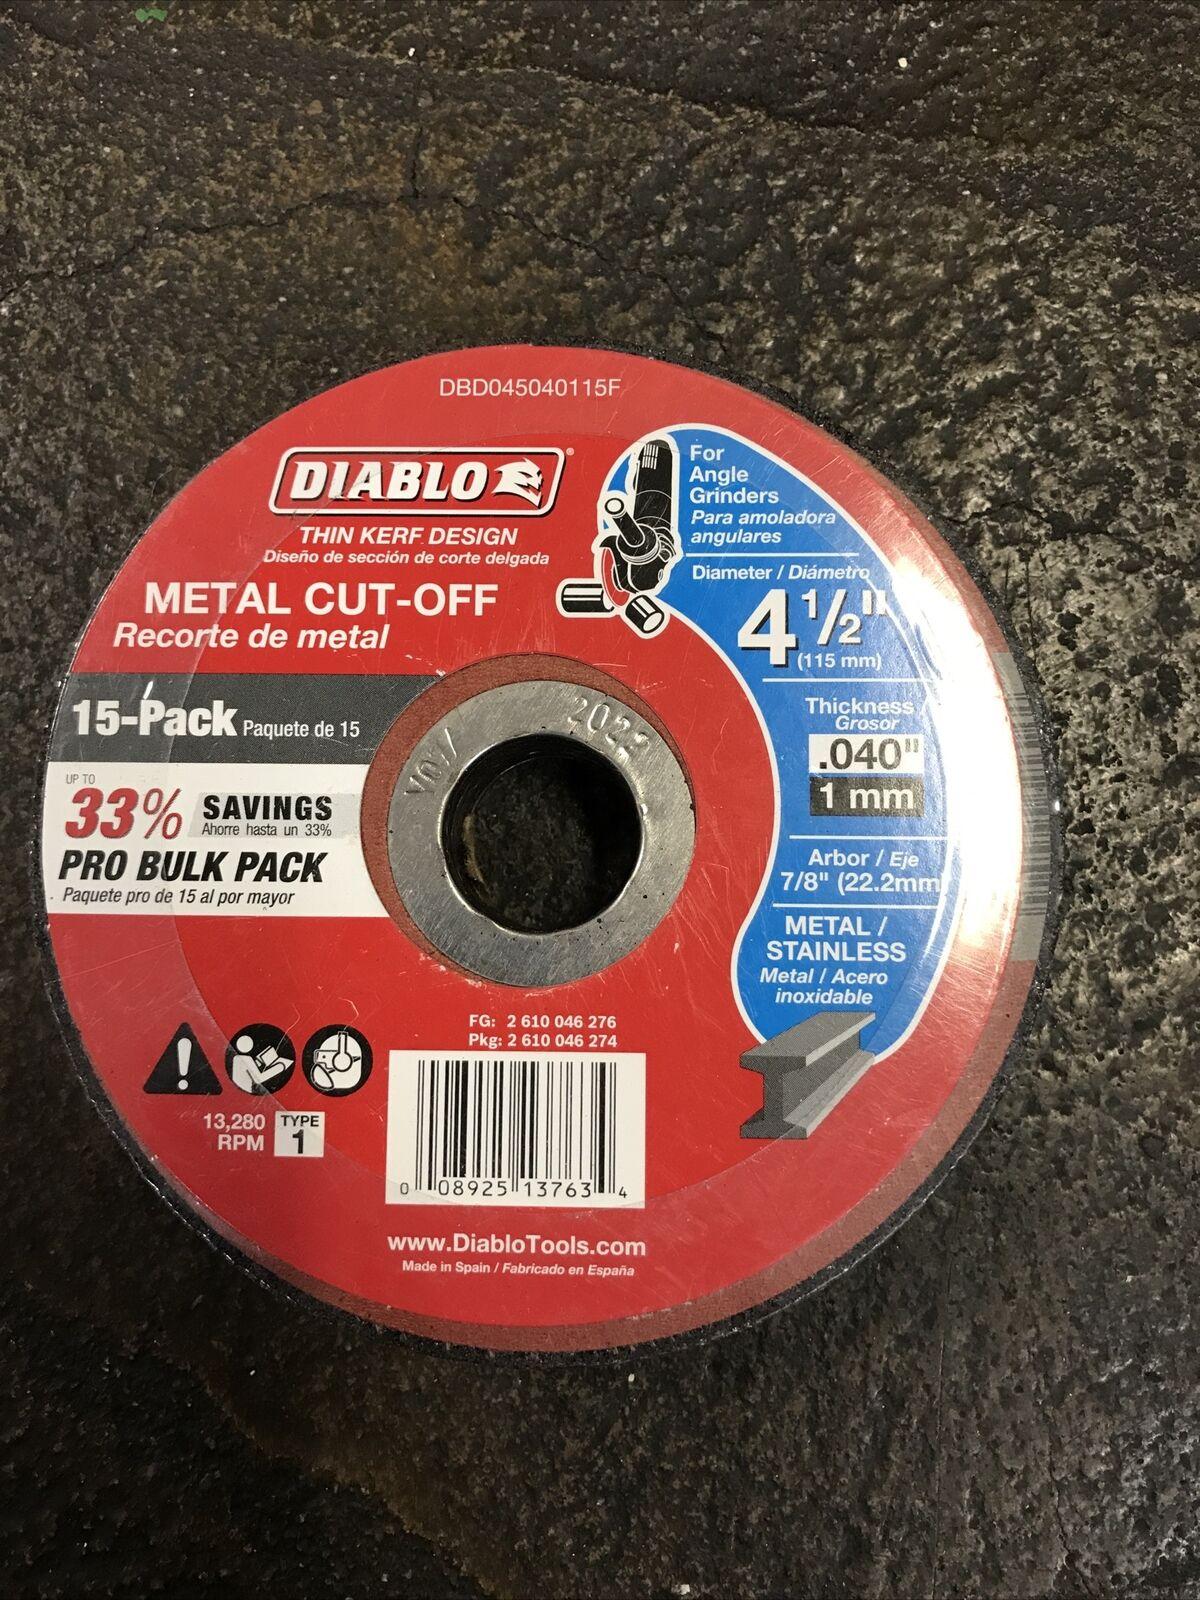 Diablo  4-1//2in Aluminum Oxide  Metal Cut-Off Disc  0.04in  x 7//8in   25 pk